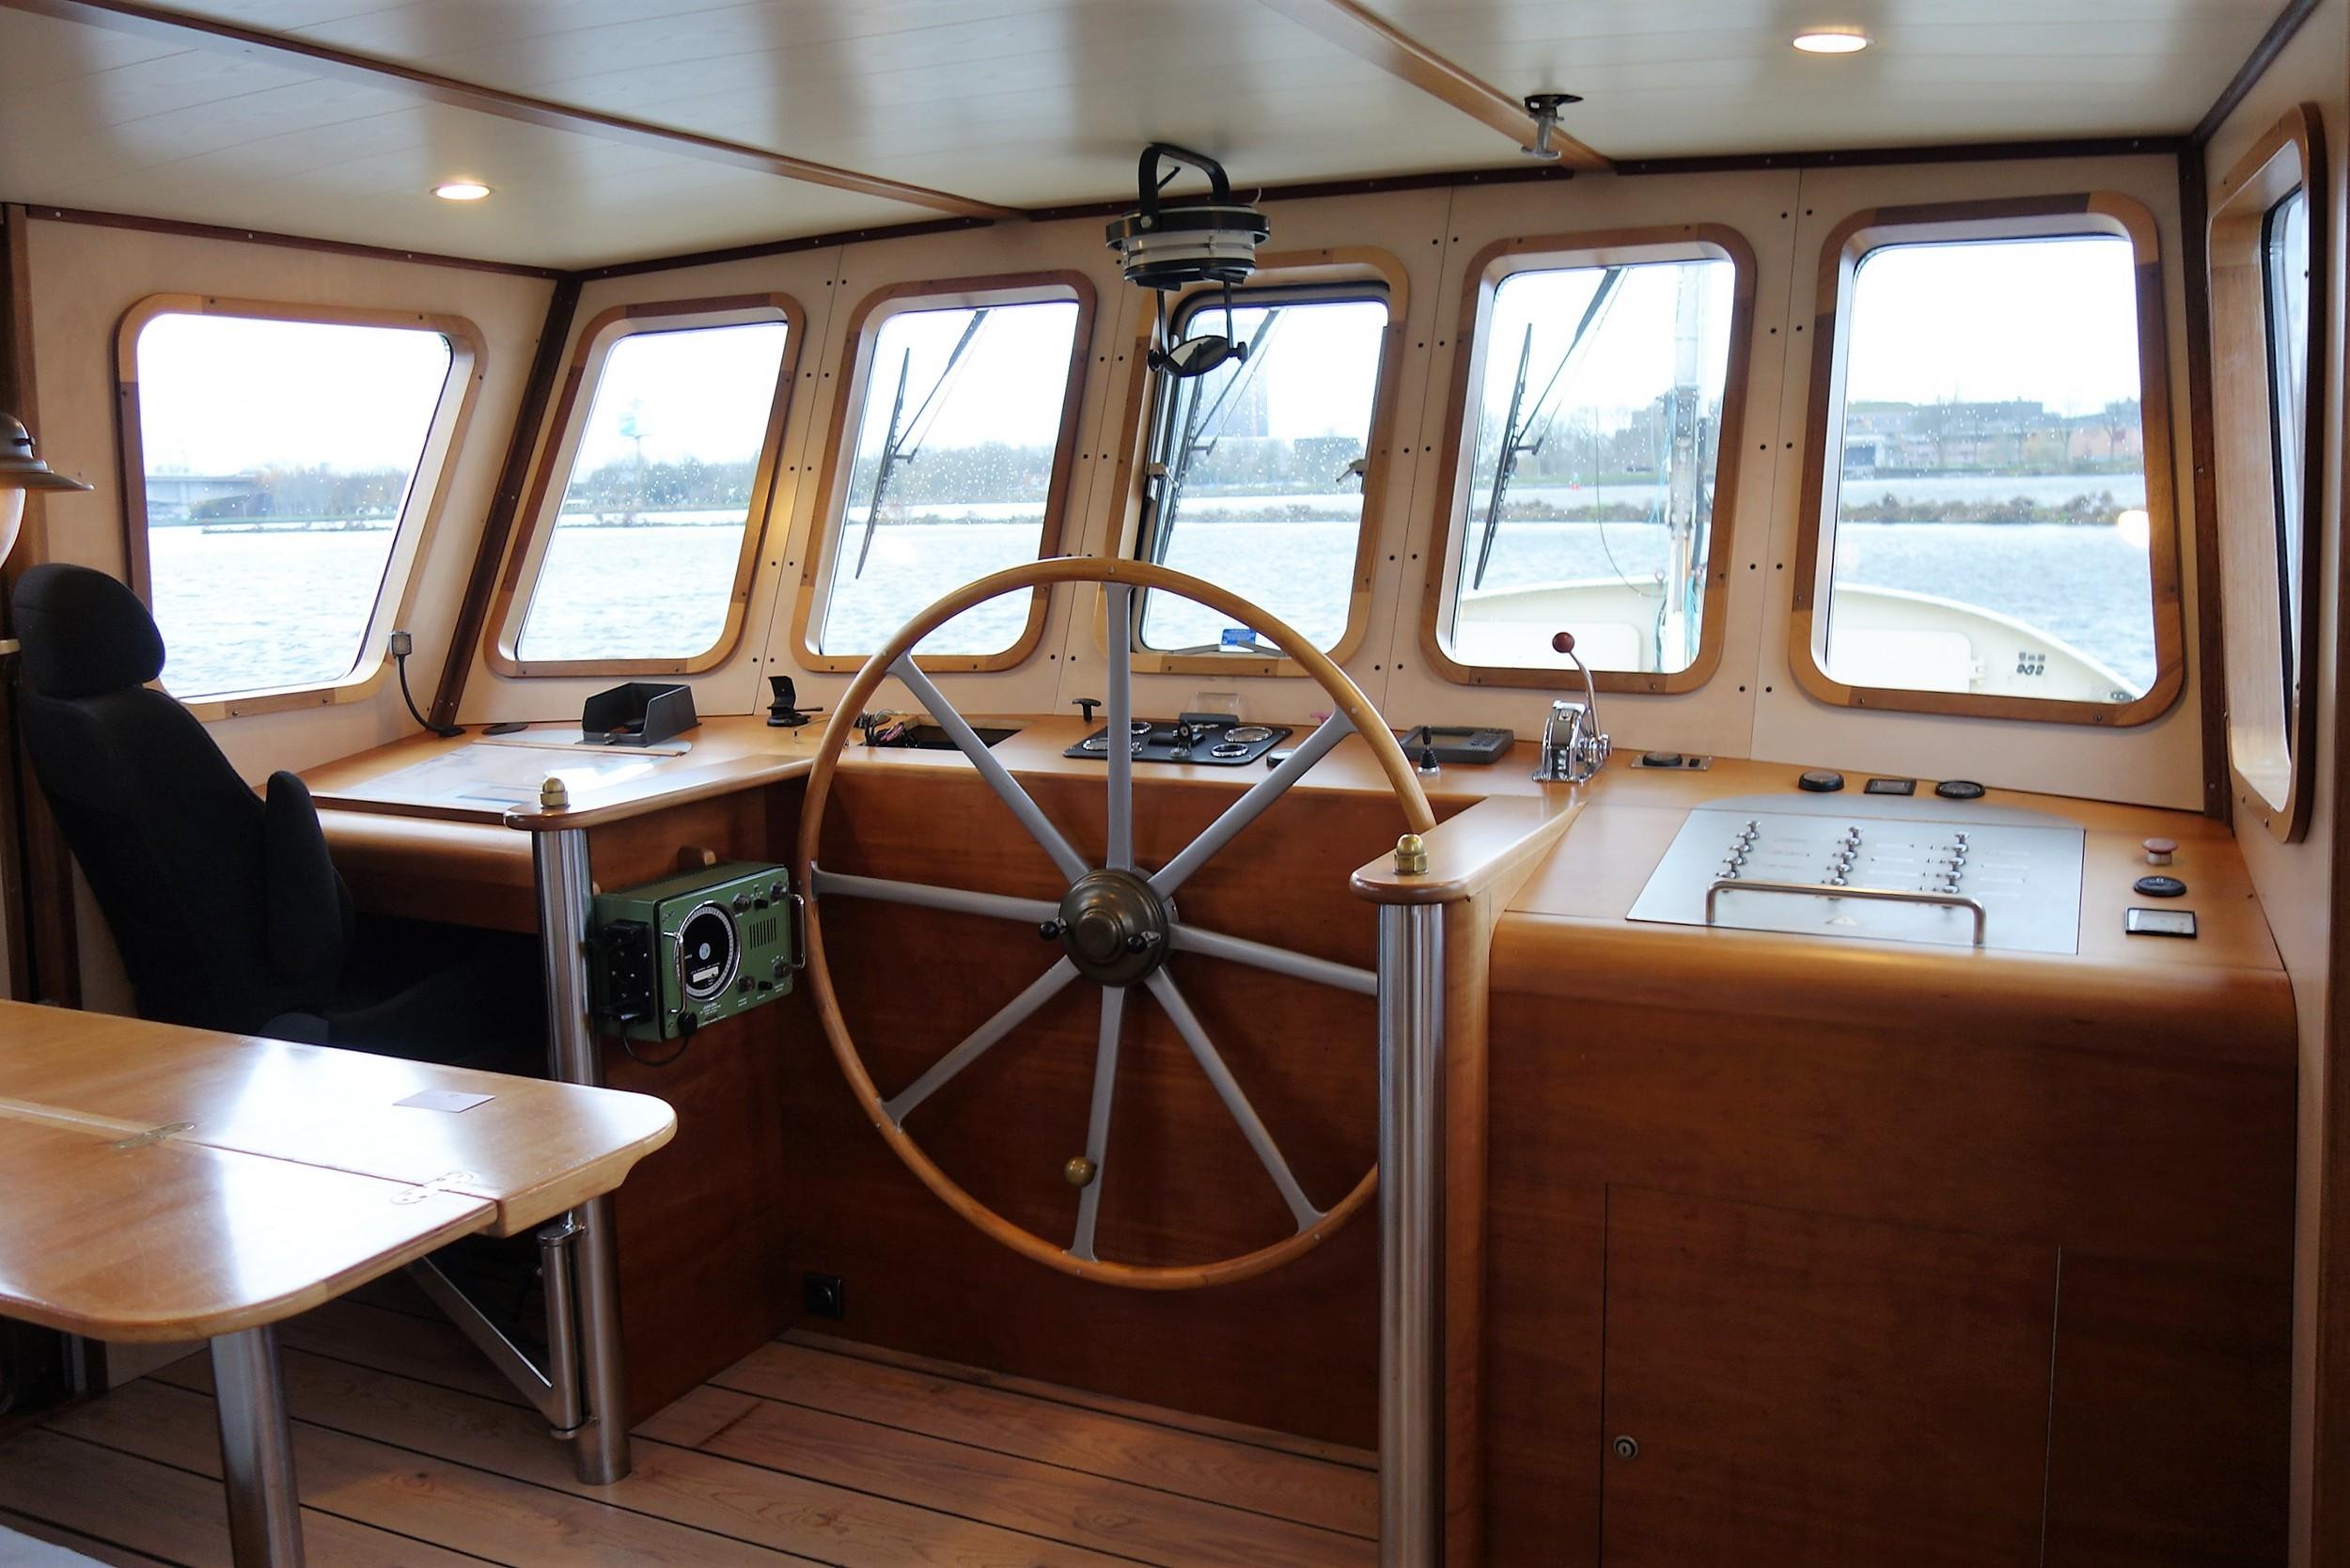 Motorkruisers en Jachten Bekebrede Trawler Flevolution 1750 foto 5